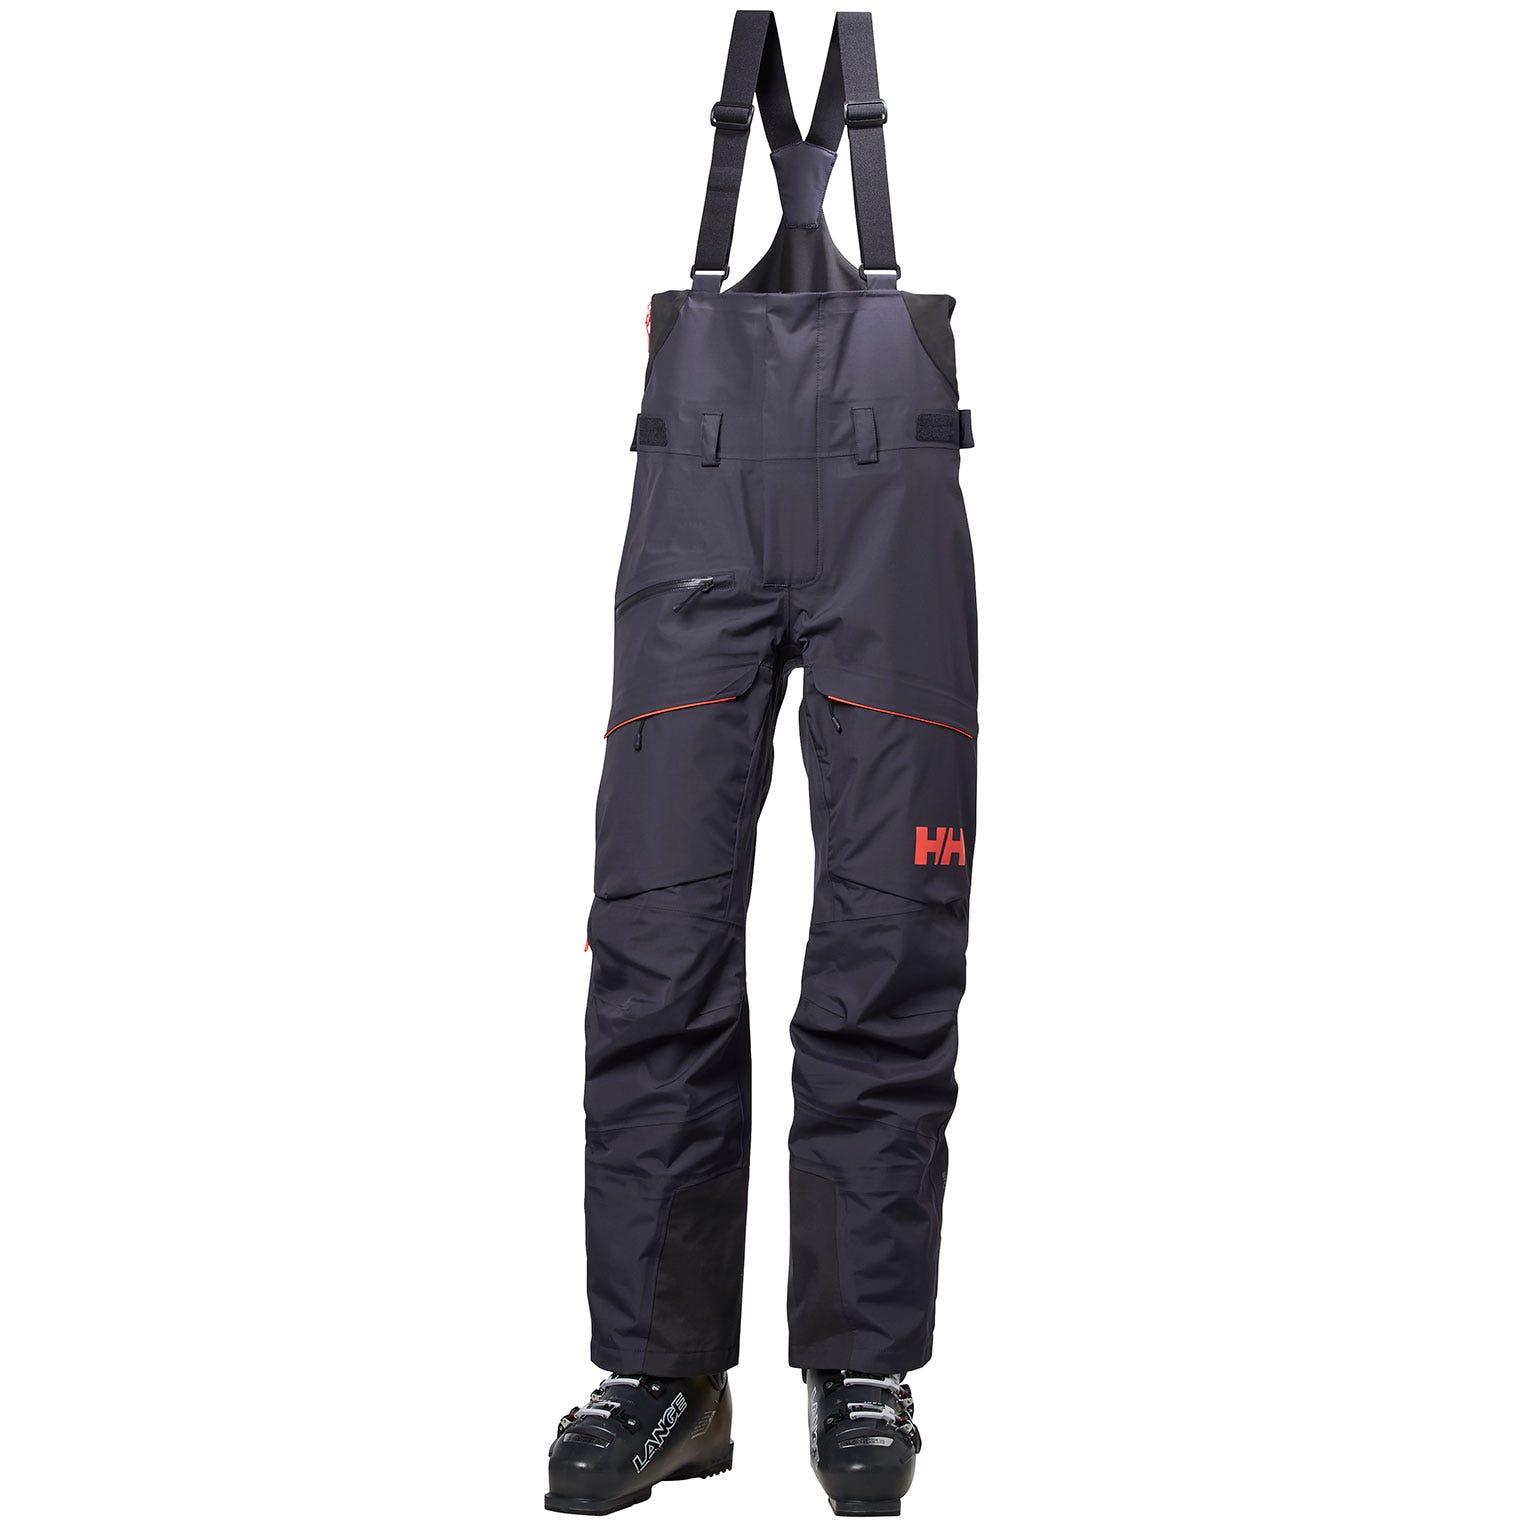 b7d1450ecb Womens Kvitegga Regular Fit Bib Shell Pant